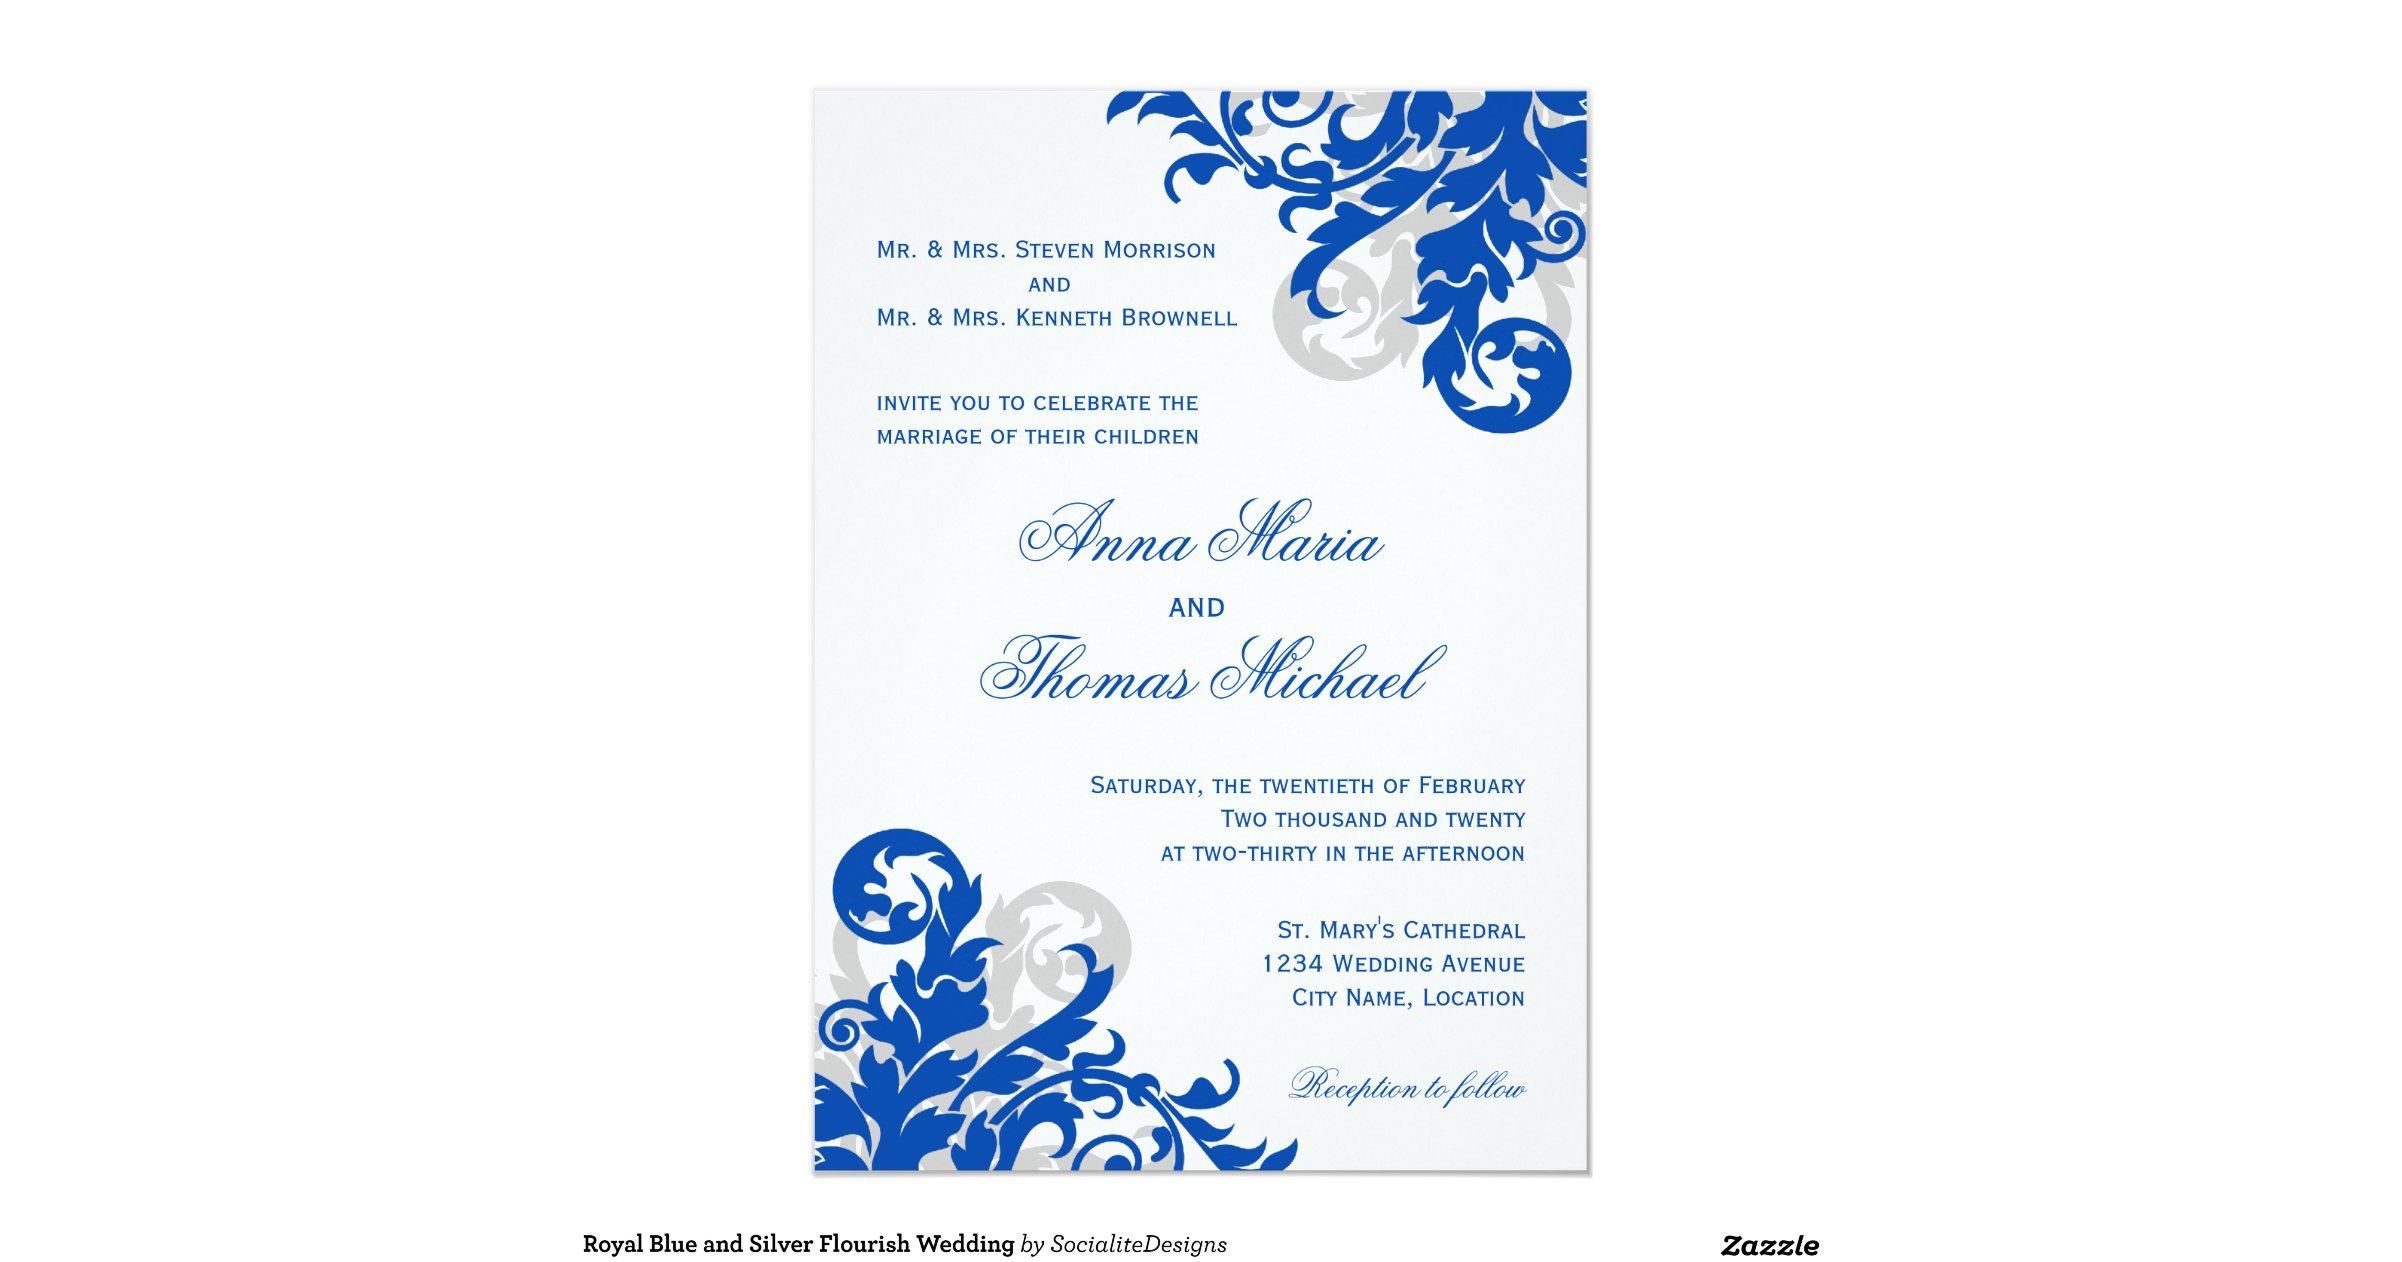 royal_blue_and_silver_flourish_wedding_invitation ...